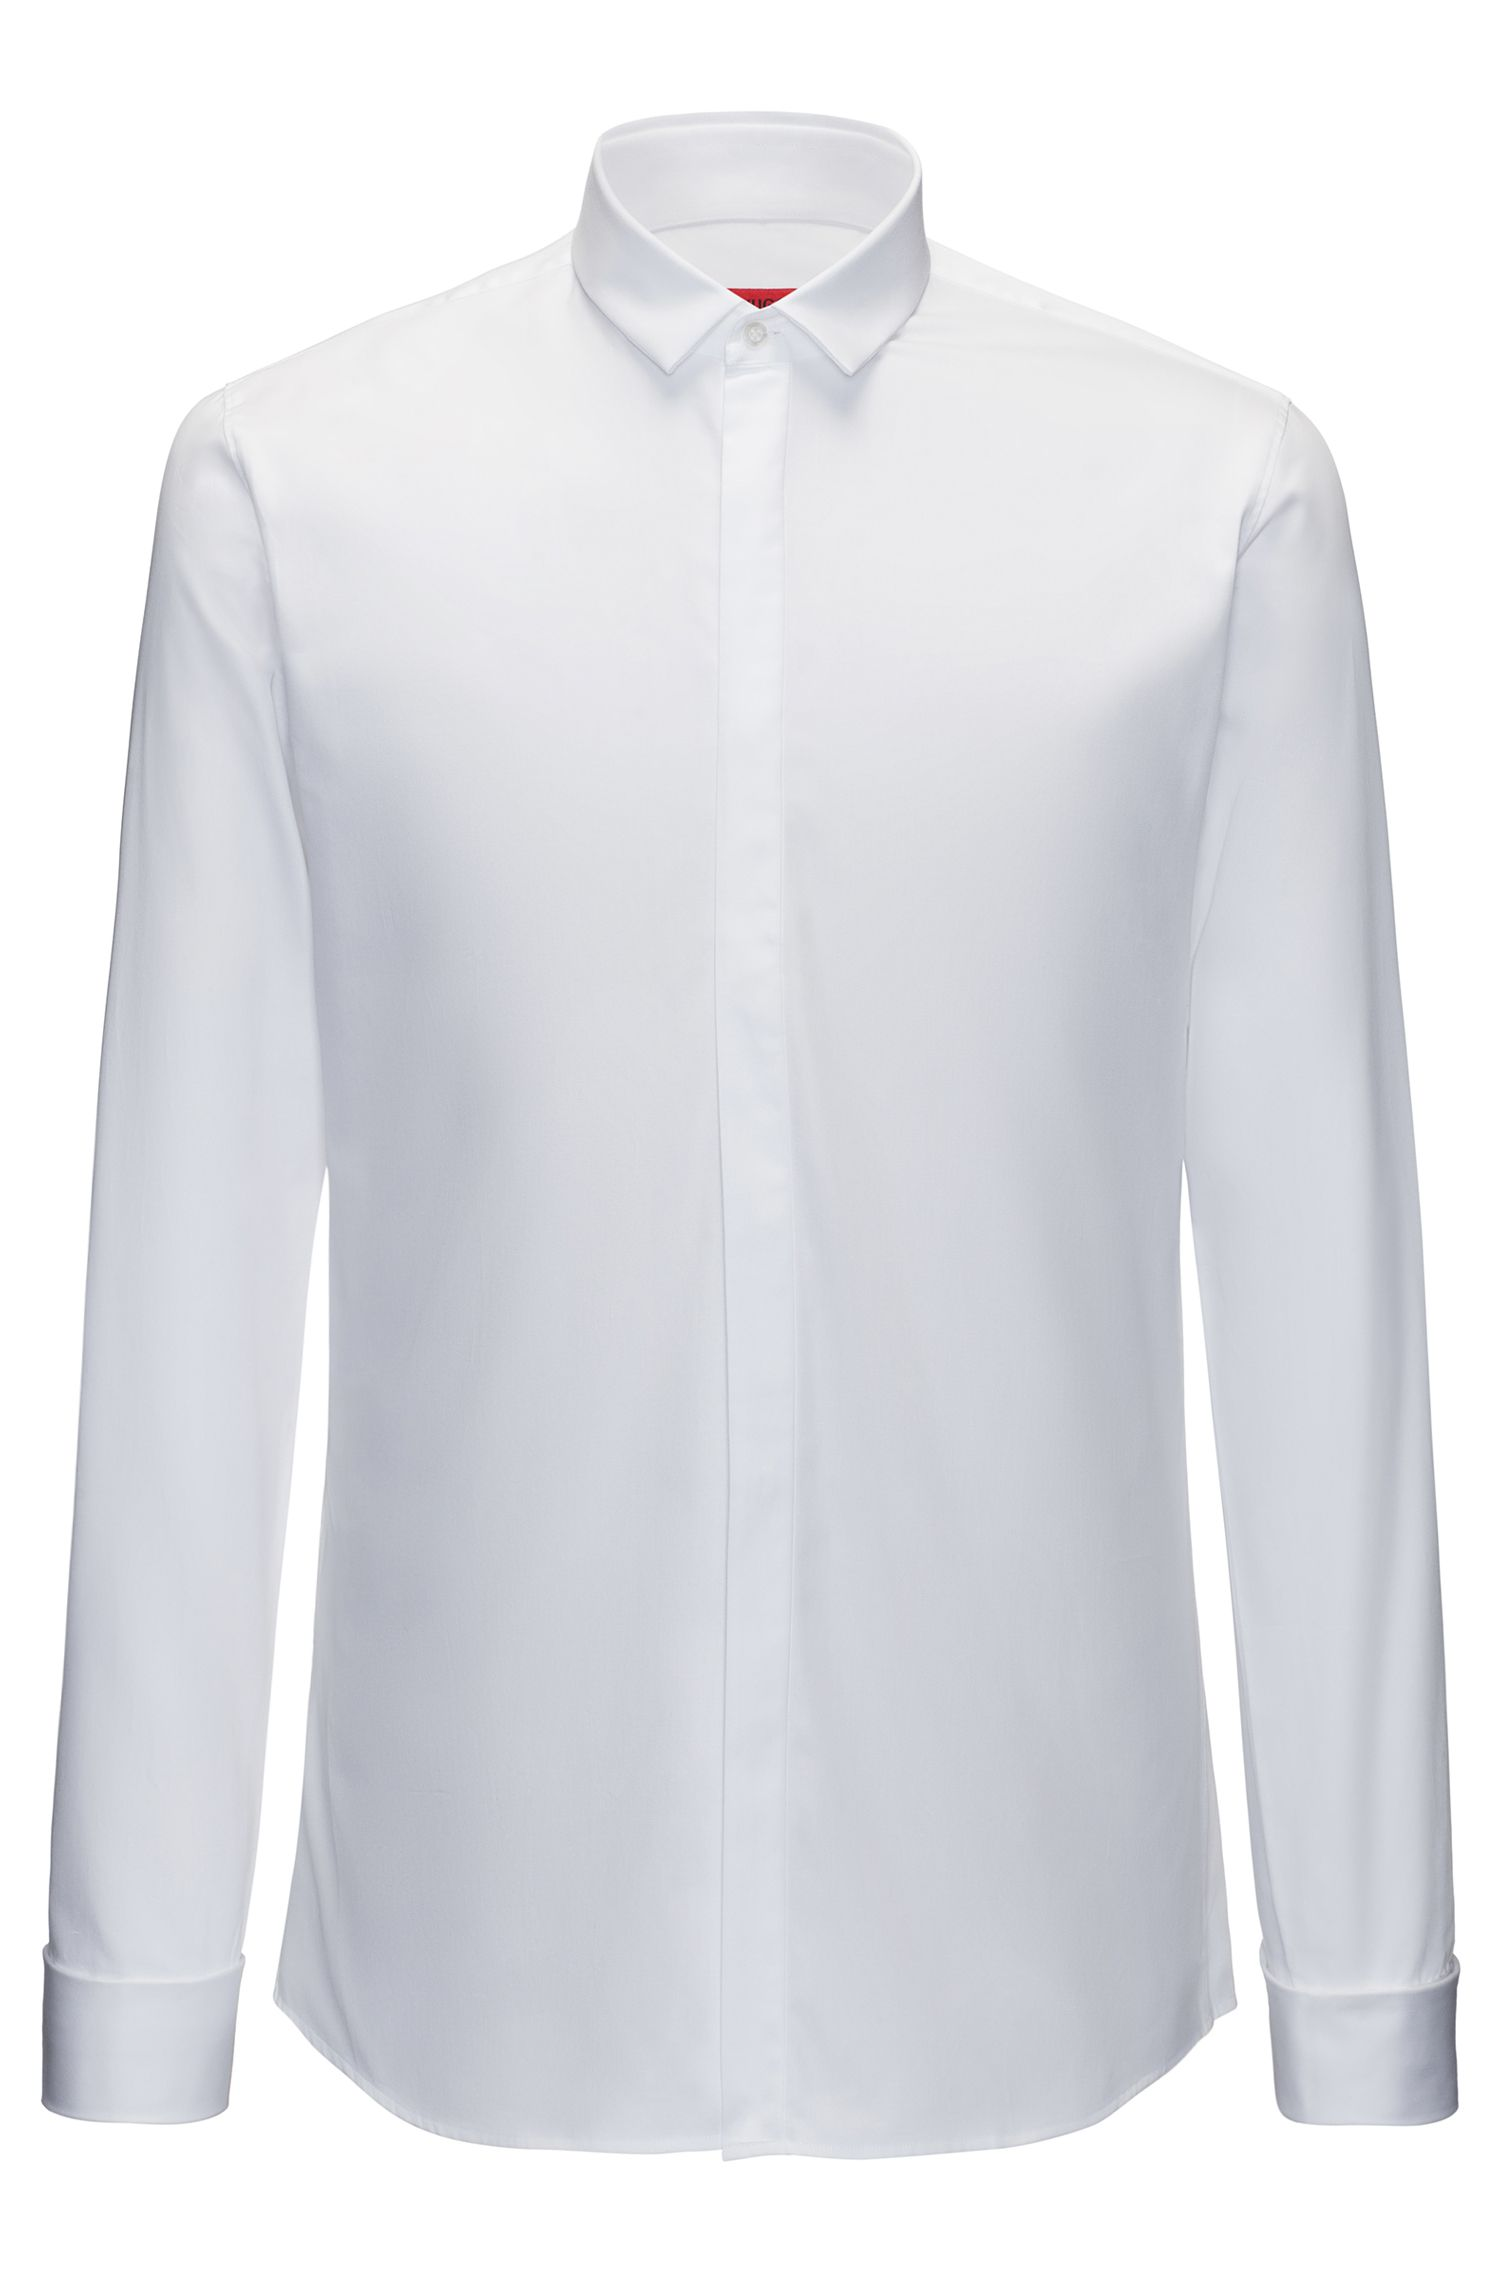 Easy-Iron Cotton Dress Shirt, Extra Slim Fit | Ejinar